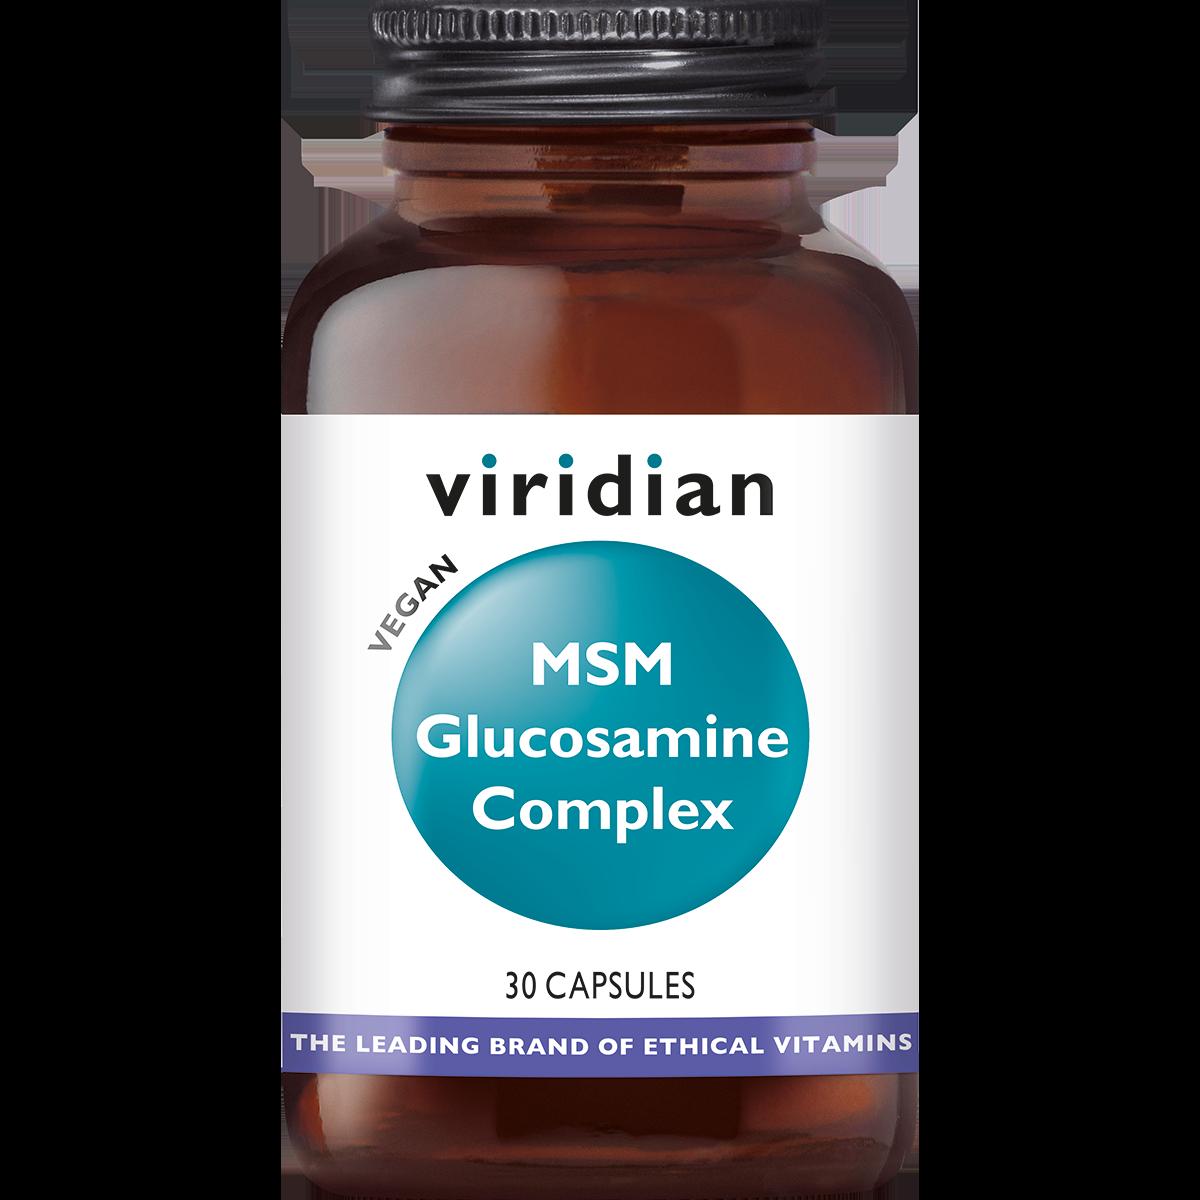 MSM Glucosamine Complex